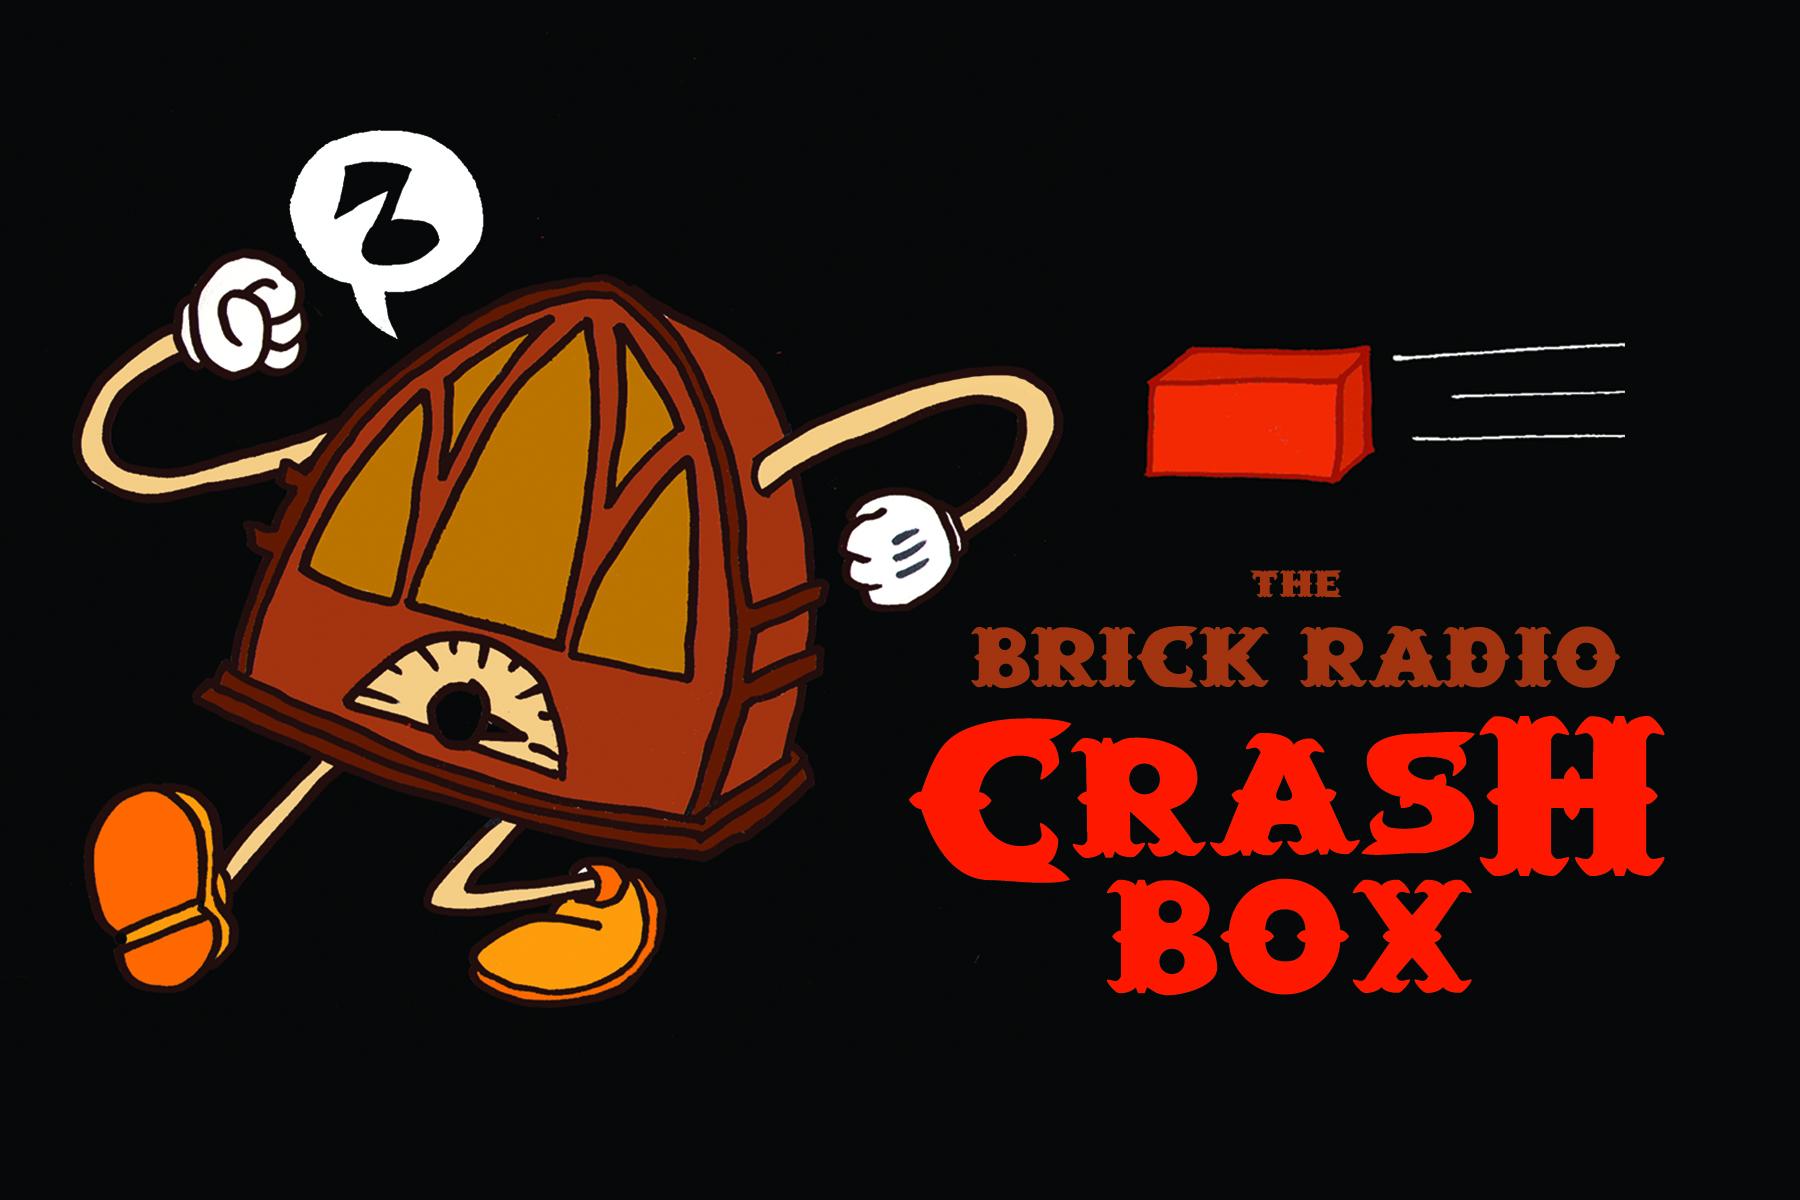 THE BRICK RADIO CRASH BOX